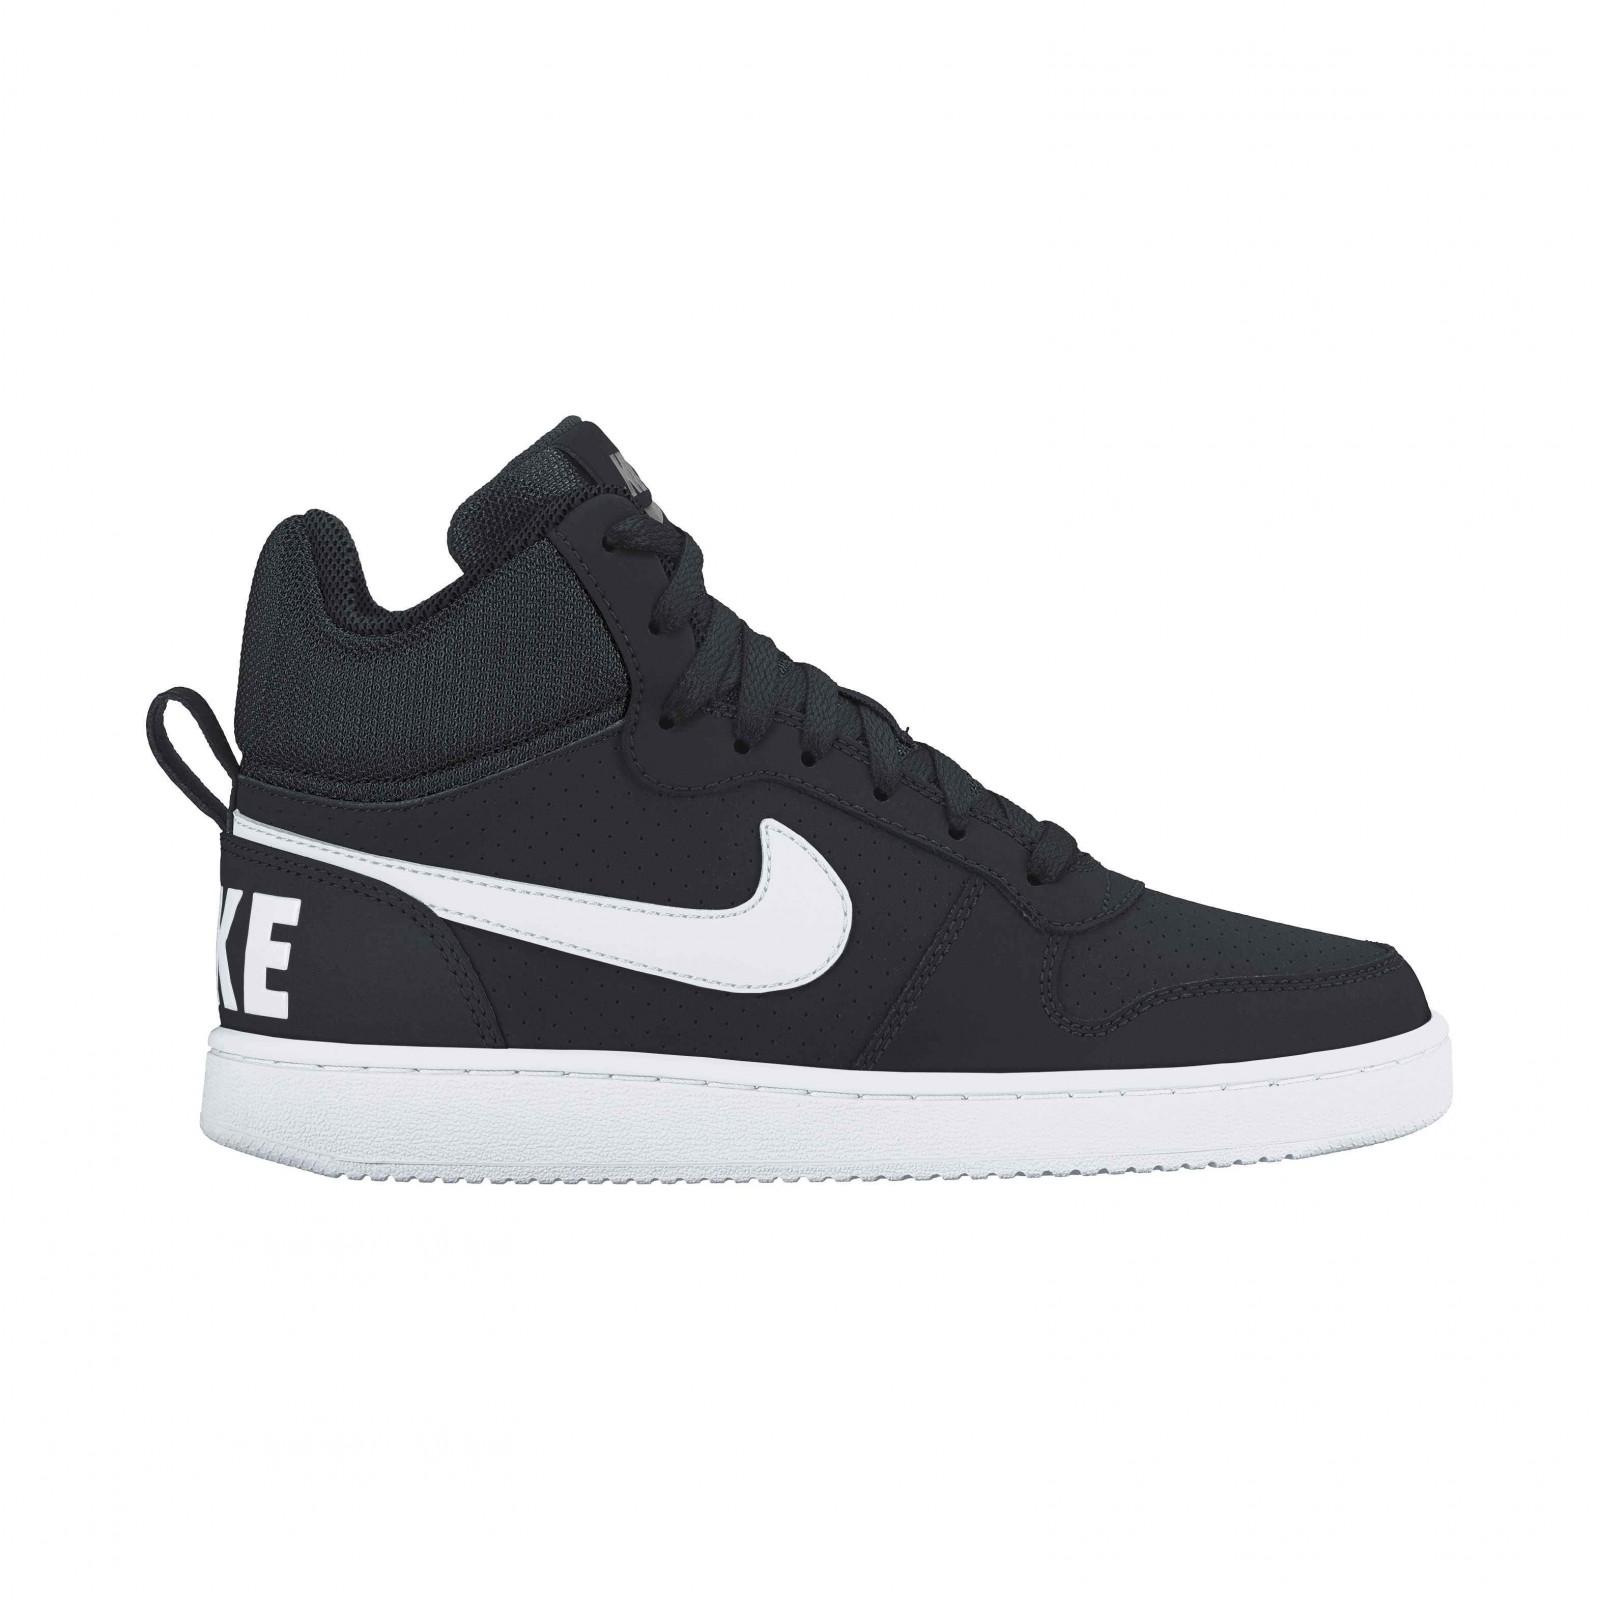 quality design a0523 54e7f Pánské Sport Tenisky Nike Borough D Court Mid rxrSTnYv